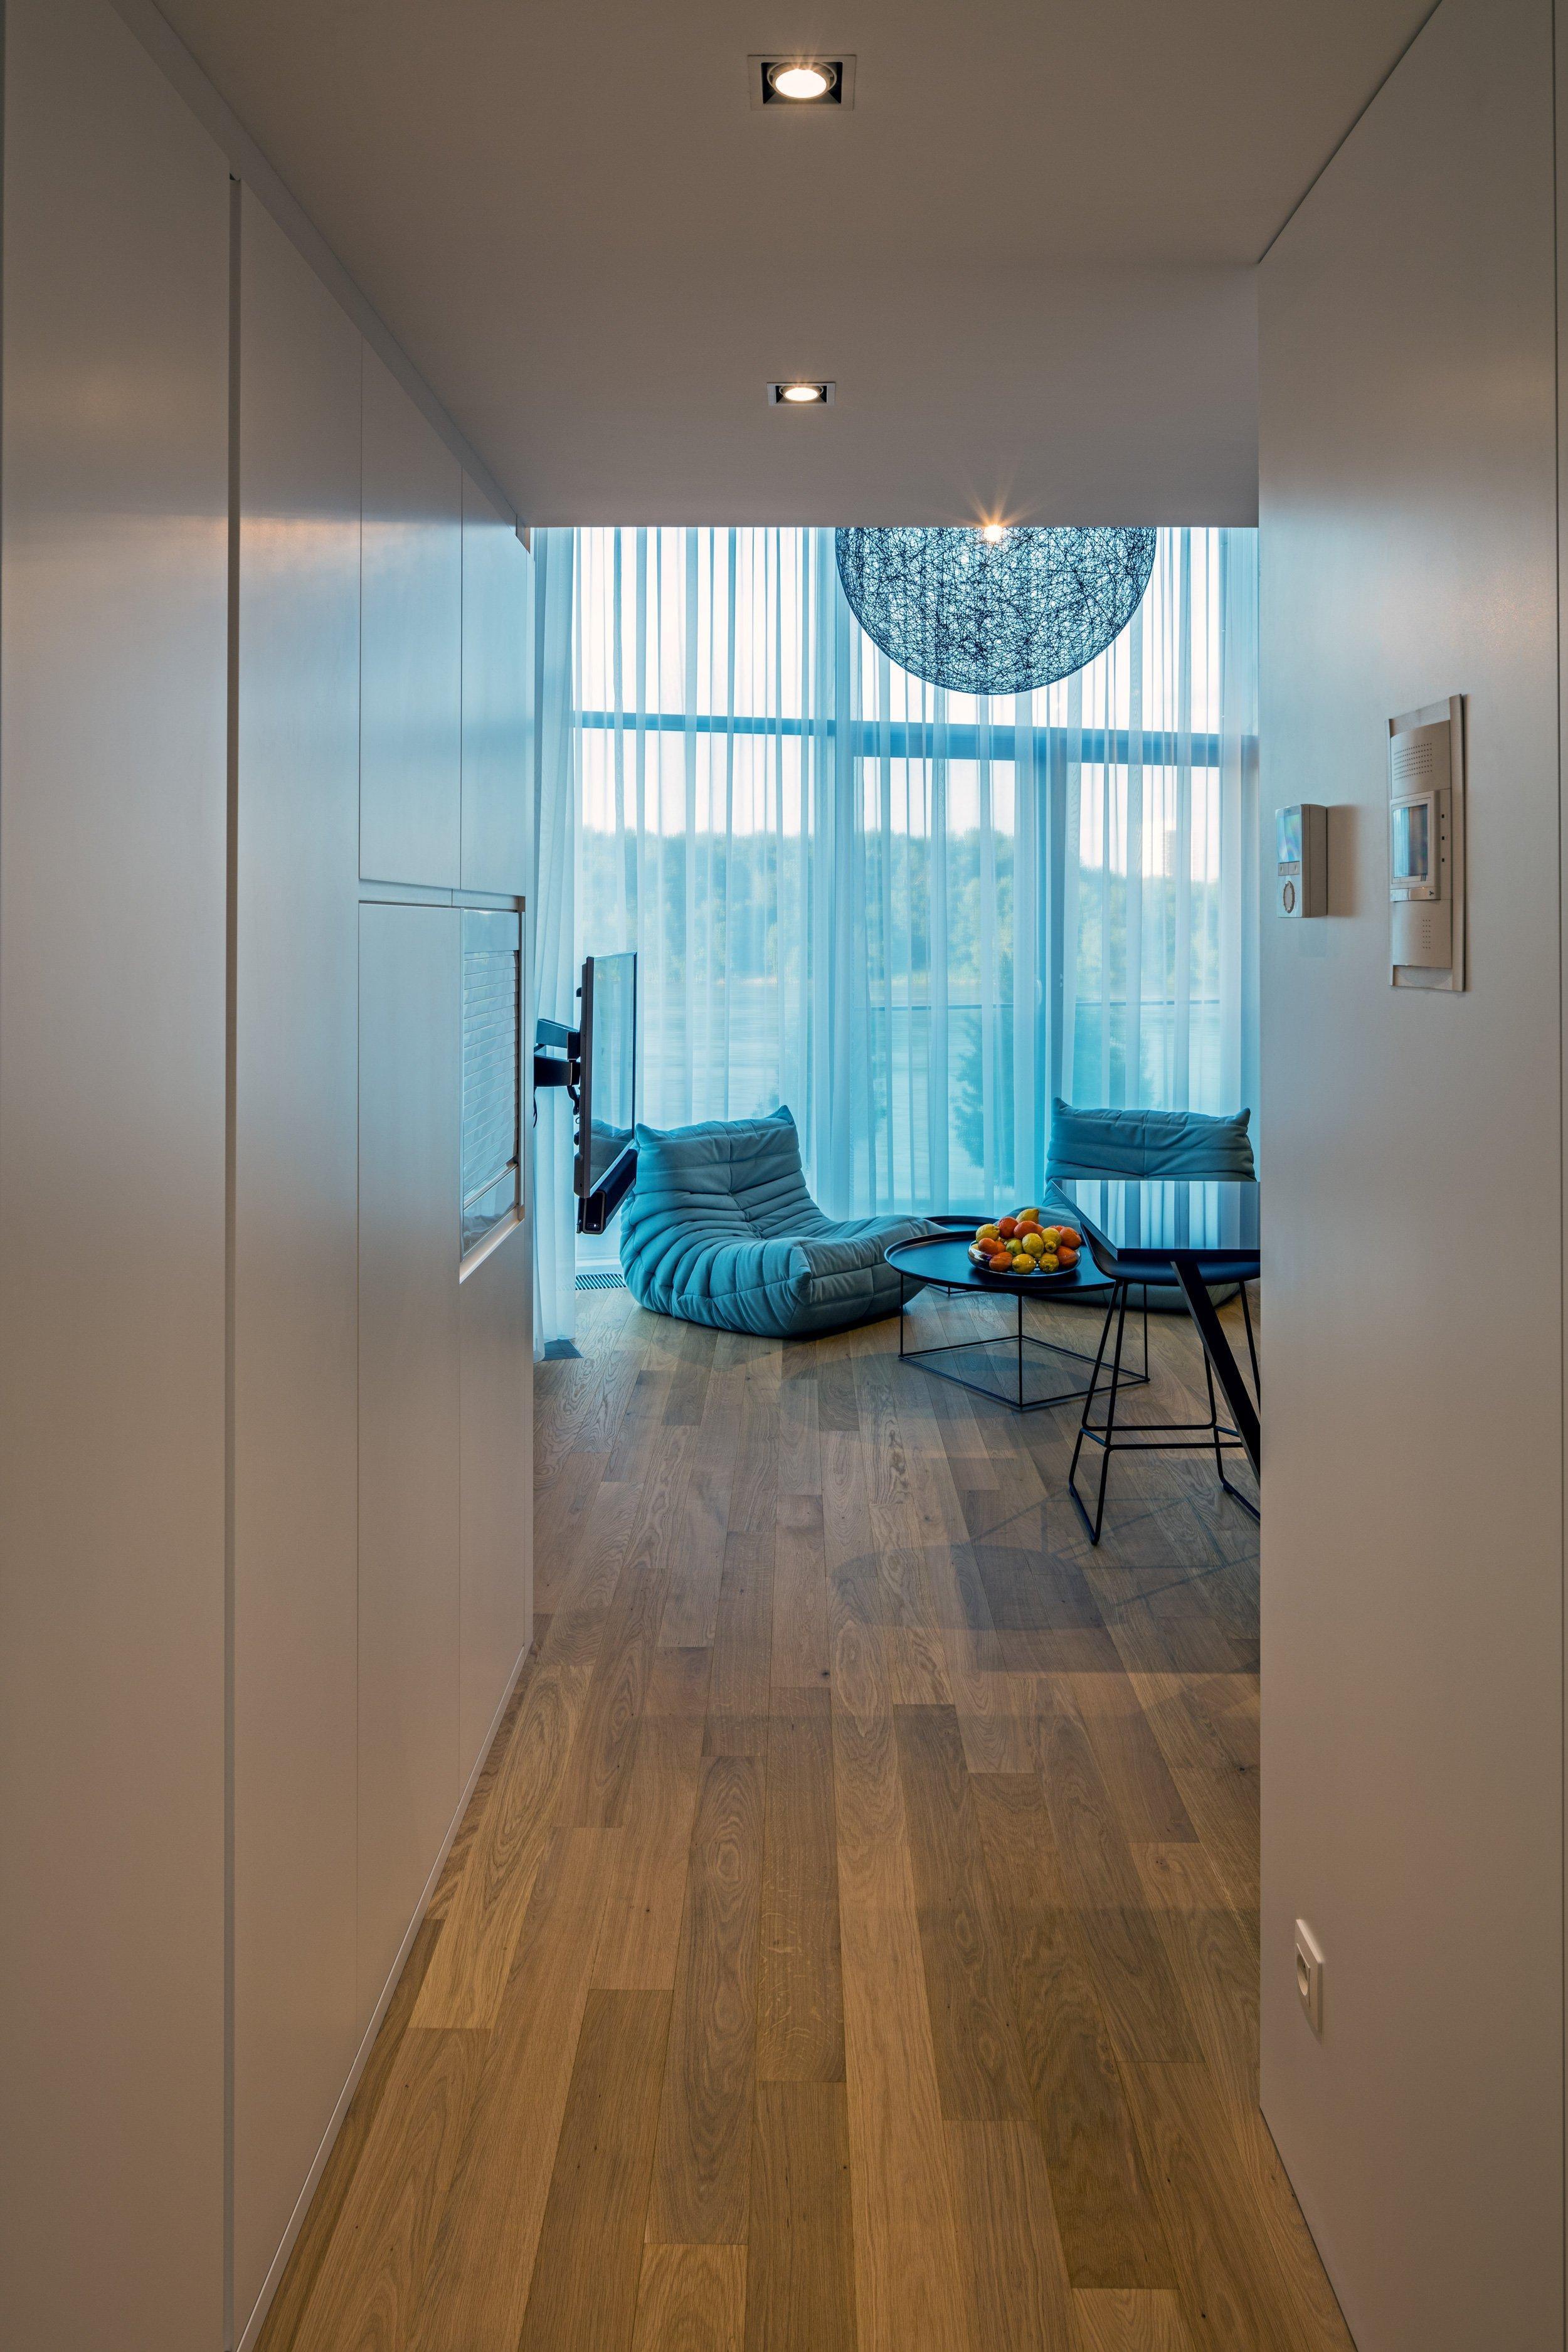 mini maisonette wohnung eurovea bratislava slowakei rules architekten. Black Bedroom Furniture Sets. Home Design Ideas